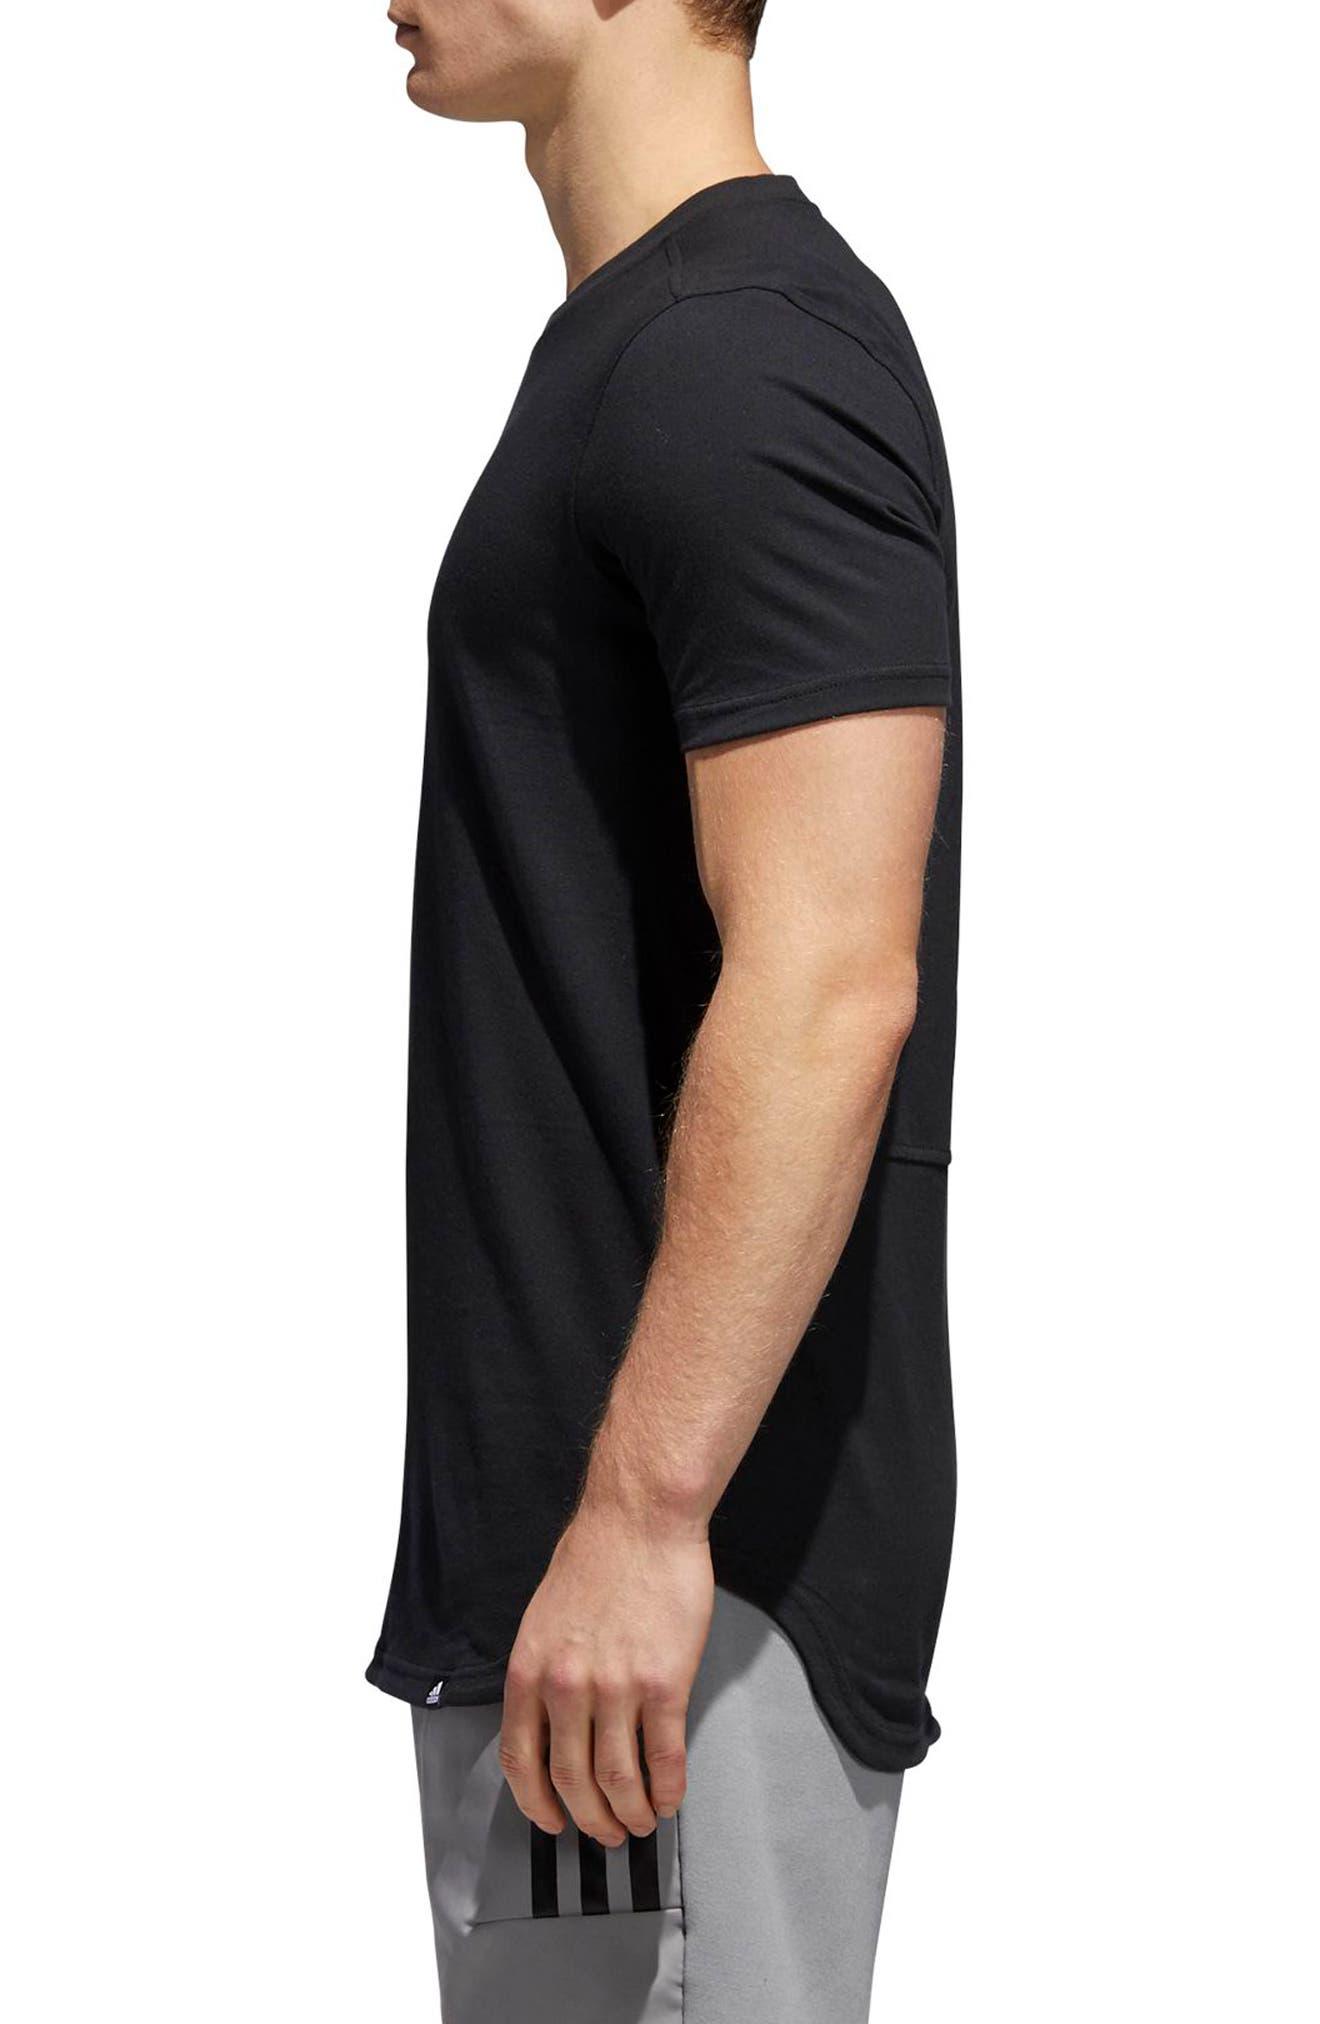 Elevate HOU T-Shirt,                             Alternate thumbnail 3, color,                             Black / White